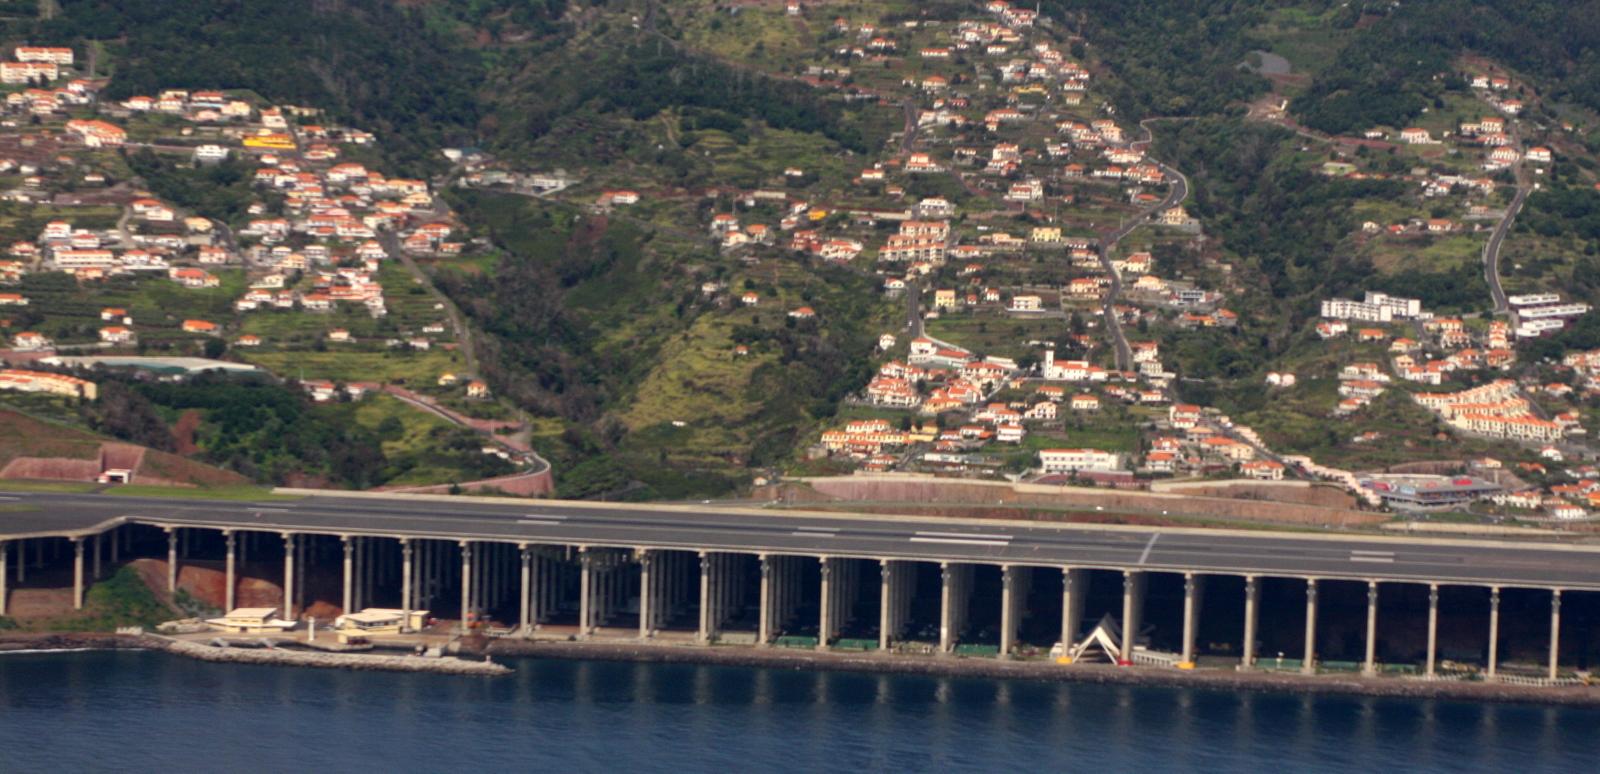 Aeroporto da Madeira_runway structure